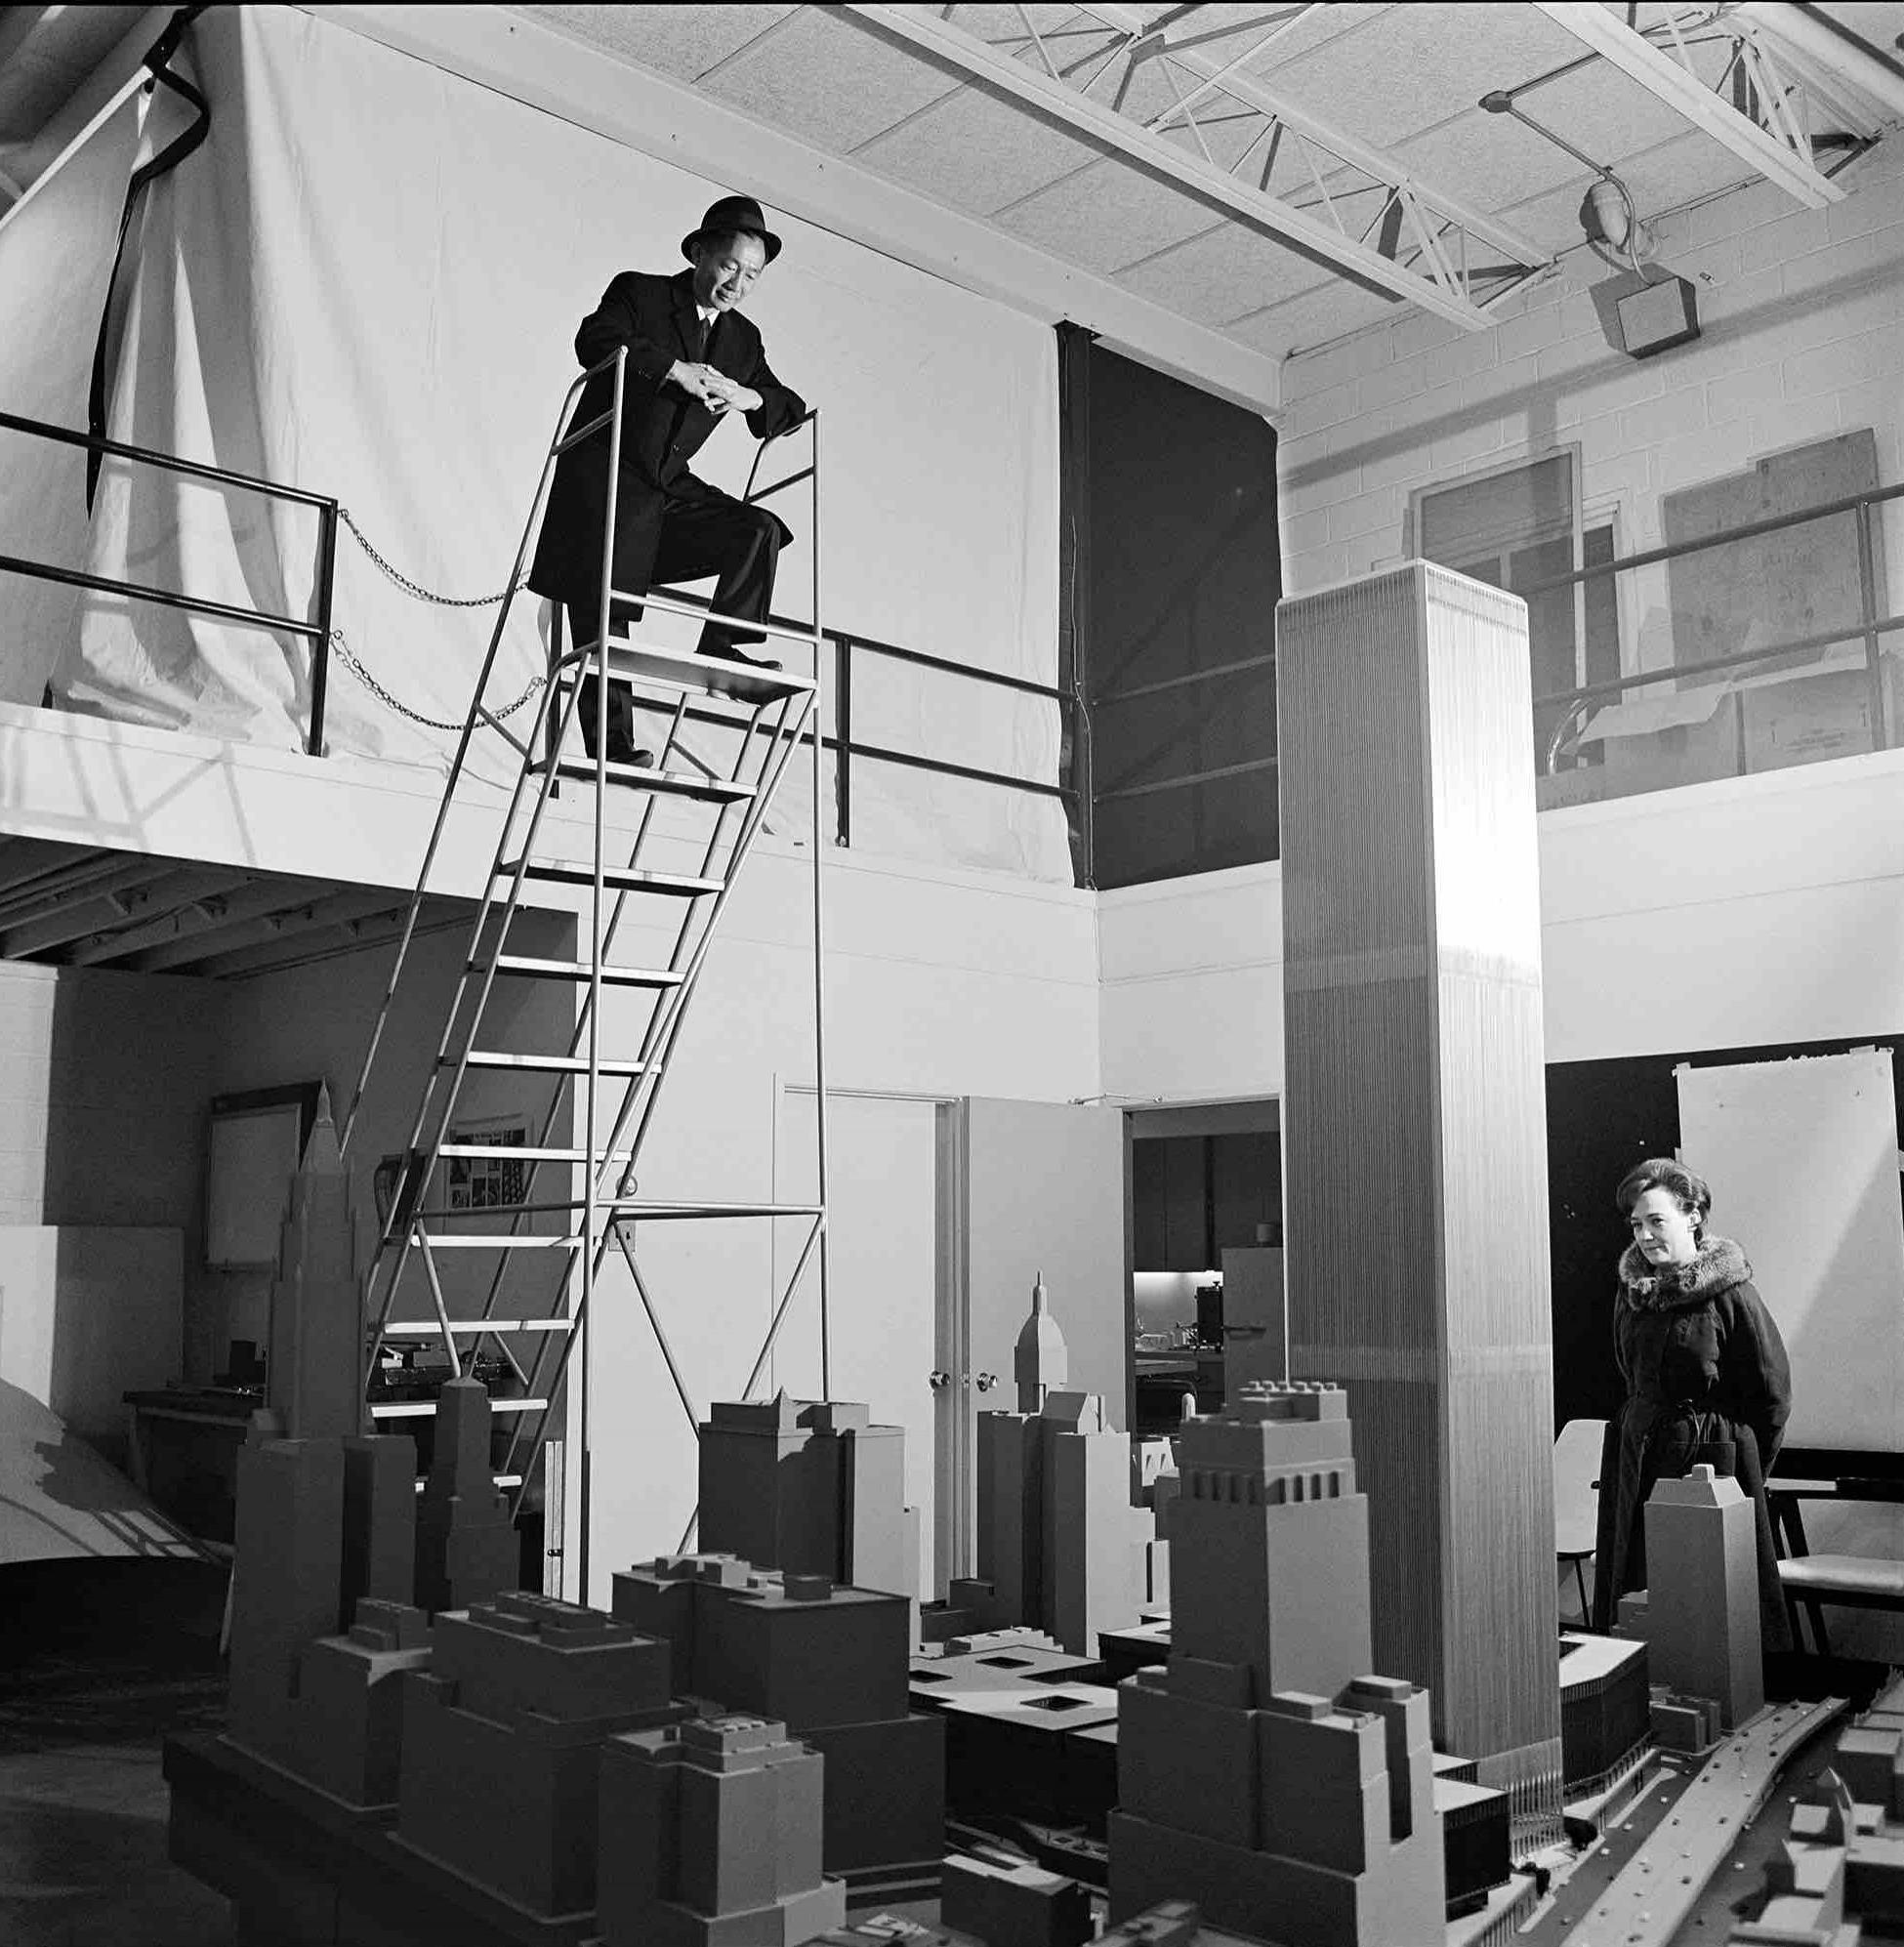 Minoru Yamasaki, World Trade Towers (New York, NY) 1973